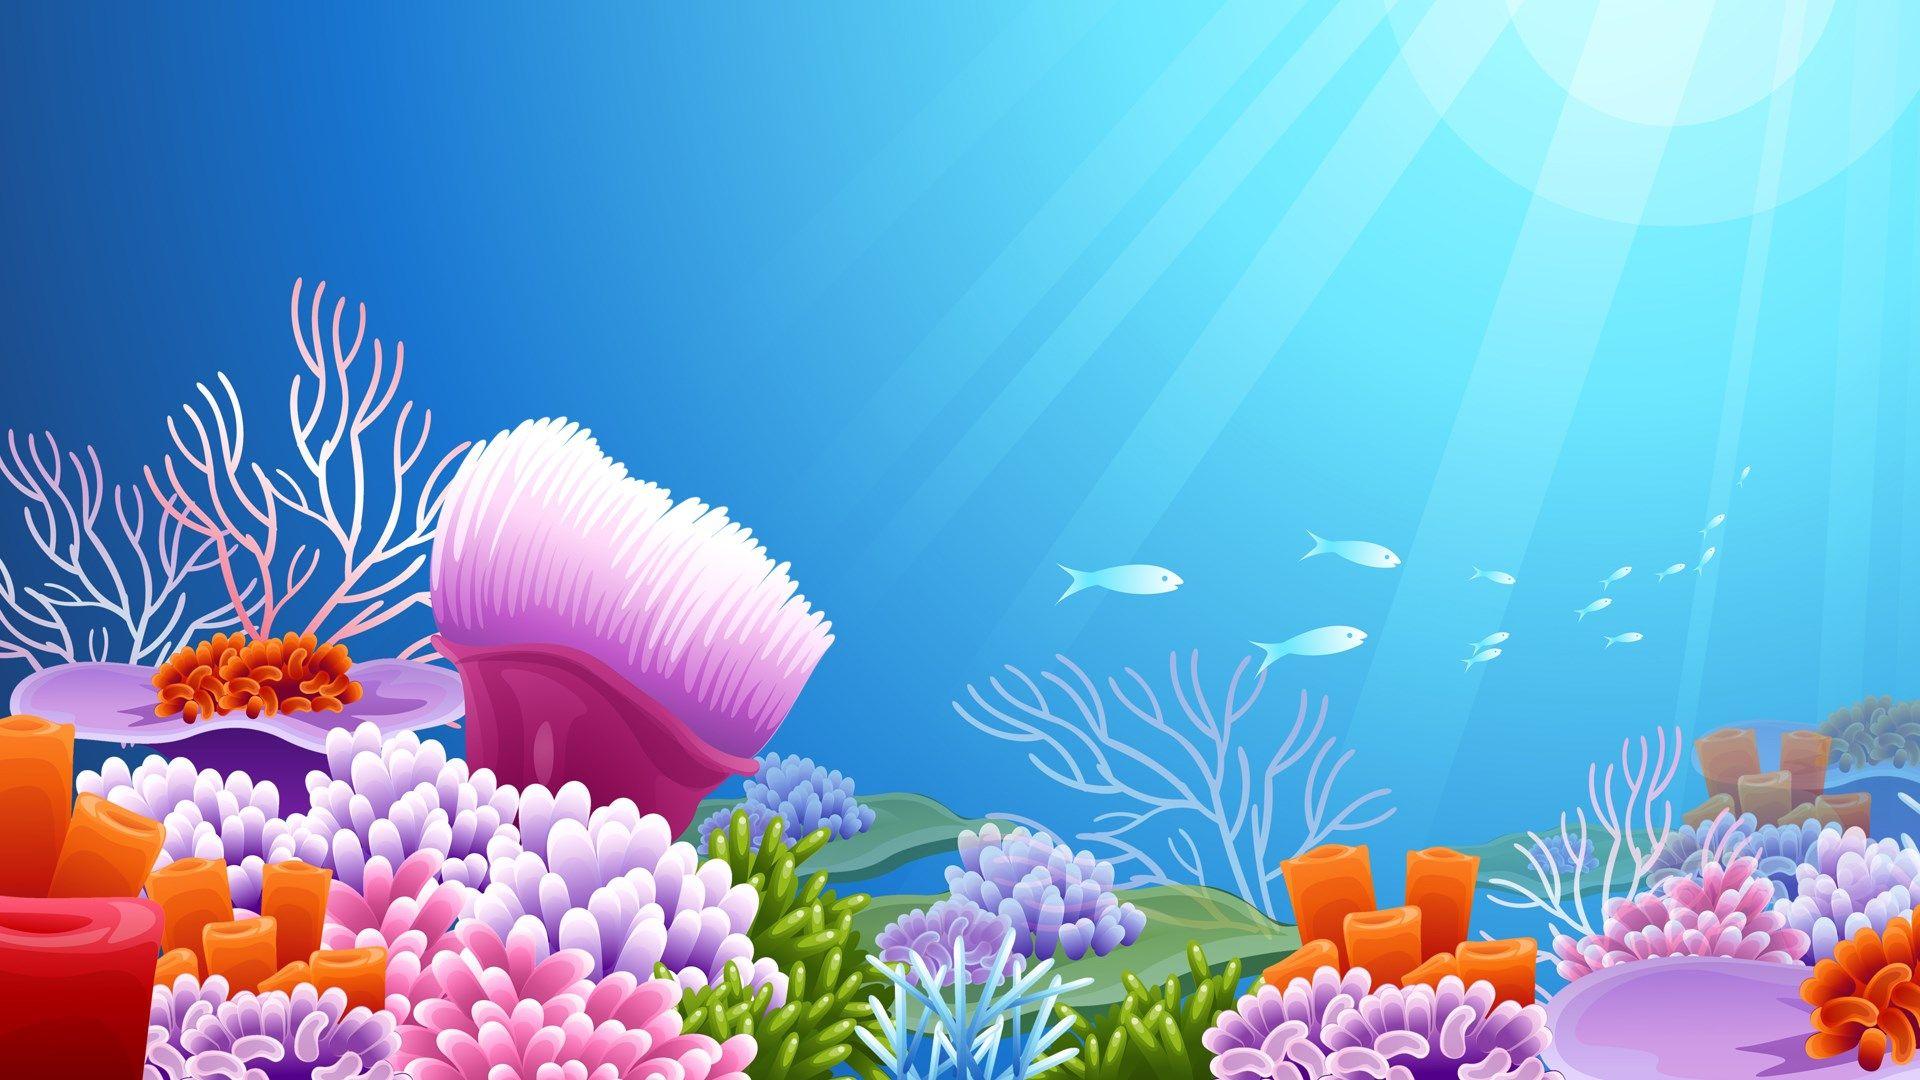 1920x1080 underwater free computer wallpaper JPG 298 kB